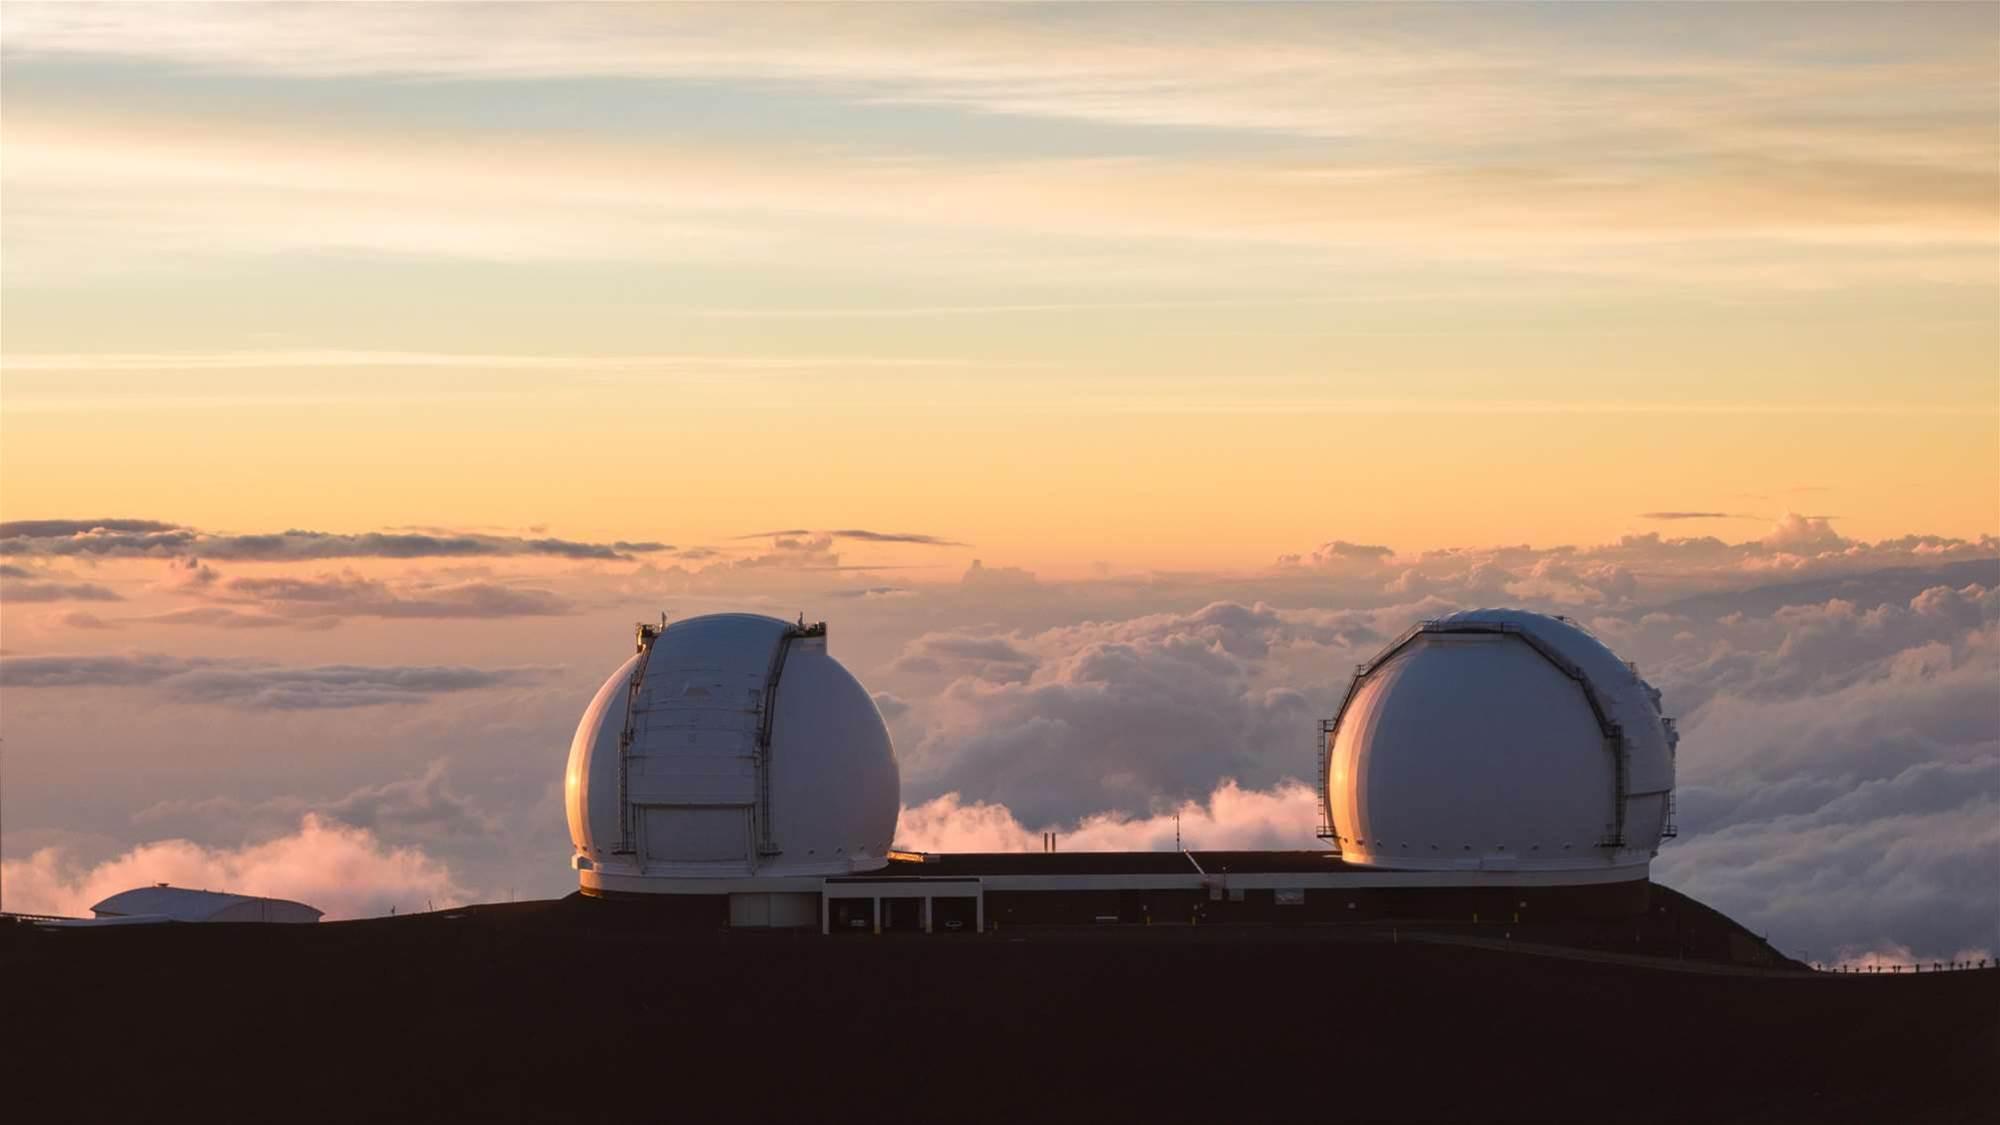 Hawaiian Court Halts Construction Of Thirty-Meter Telescope On Mauna Kea